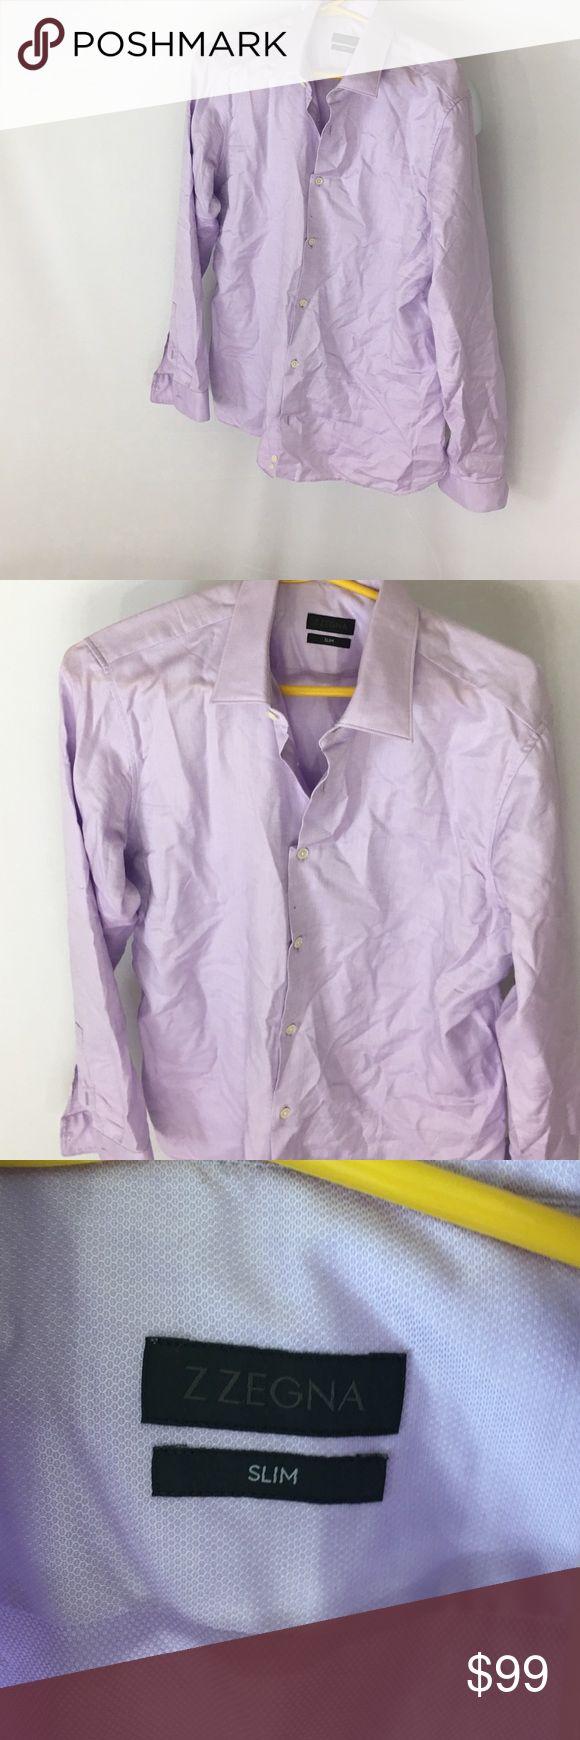 Brand NEW Z ZEGNA Slim Fit Dress Shirt Size: 41/16 Brand NEW from Nordstrom Z ZEGNA Men's Slim Fit Dress Shirt Color: Pale Purple Size: 41 Neck: 16 Z Zegna Shirts Dress Shirts